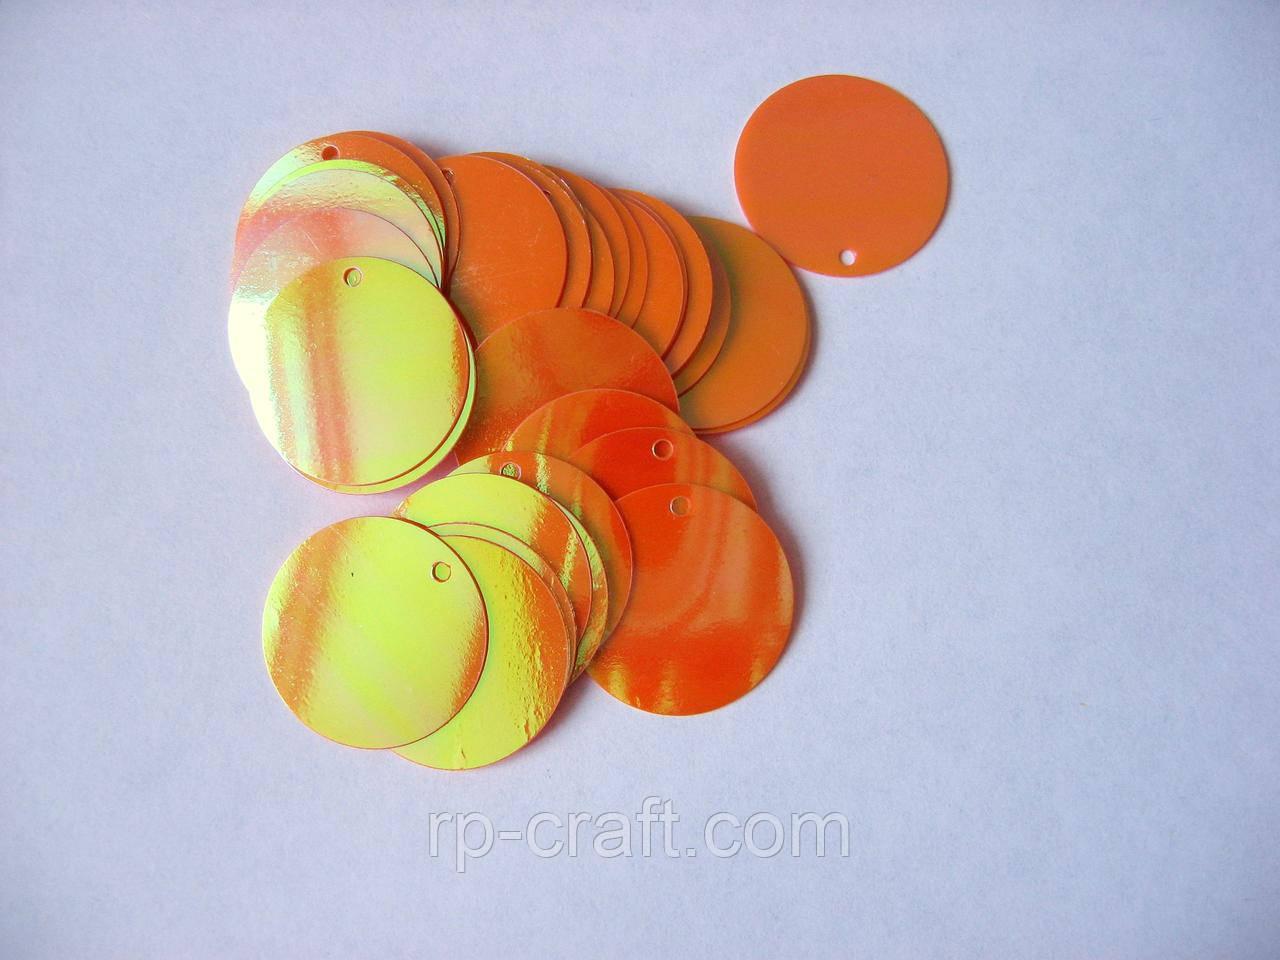 Упаковка паєток. Плоскі, круглі, 19 мм, 5 грам, помаранчеві